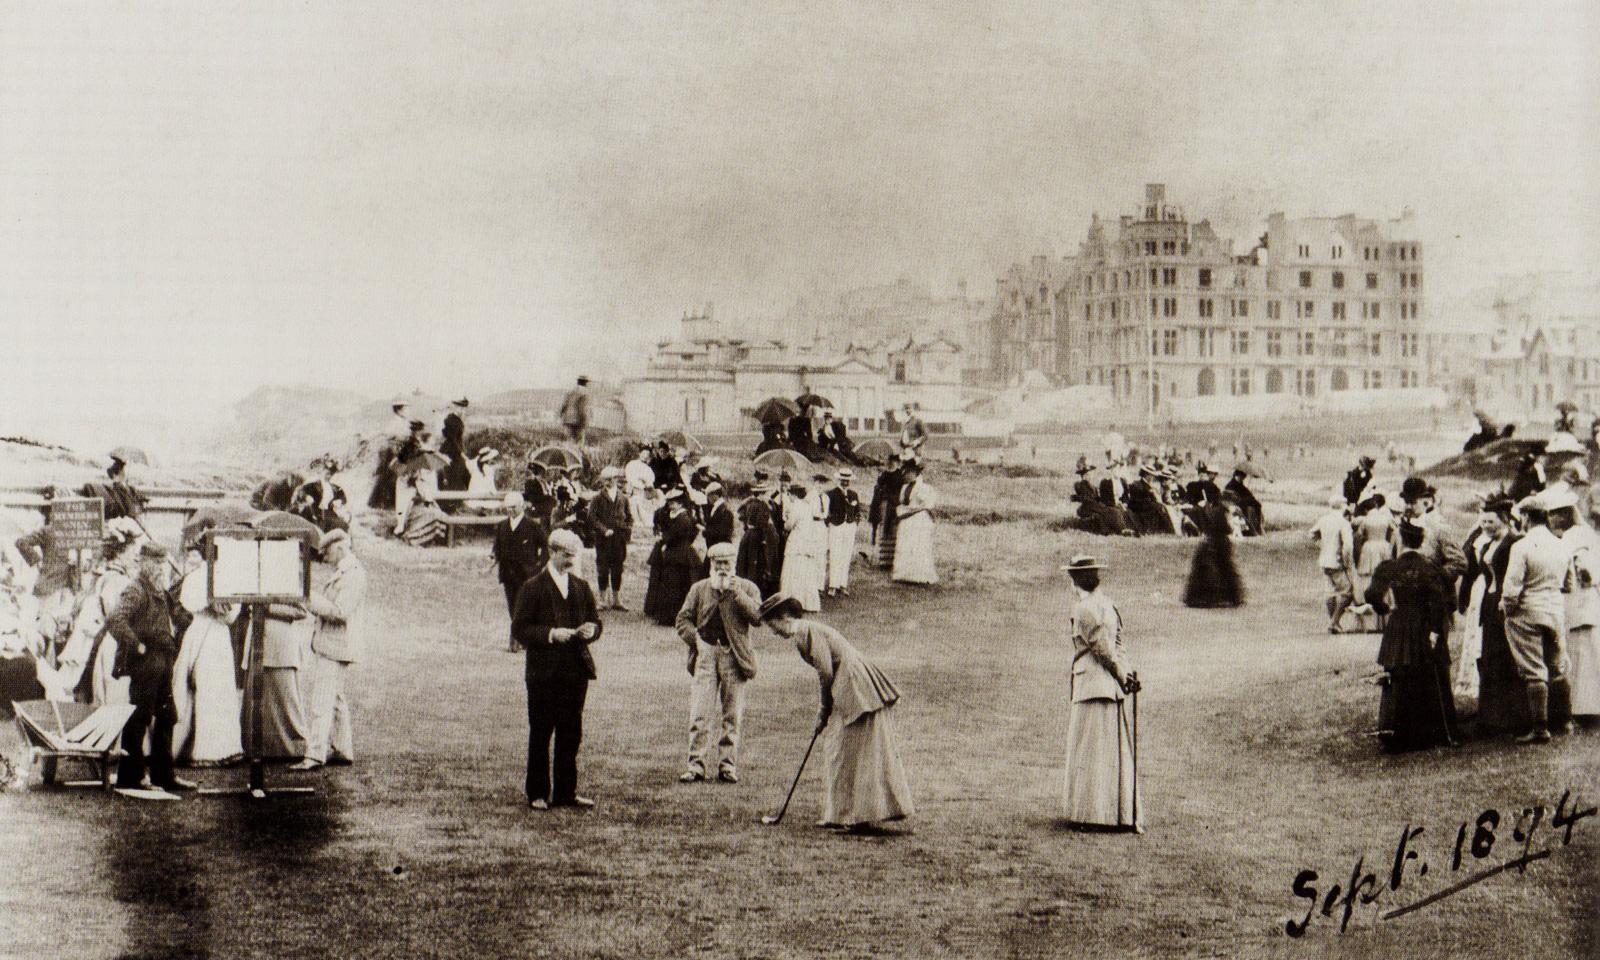 The Ladies Club at St. Andrews